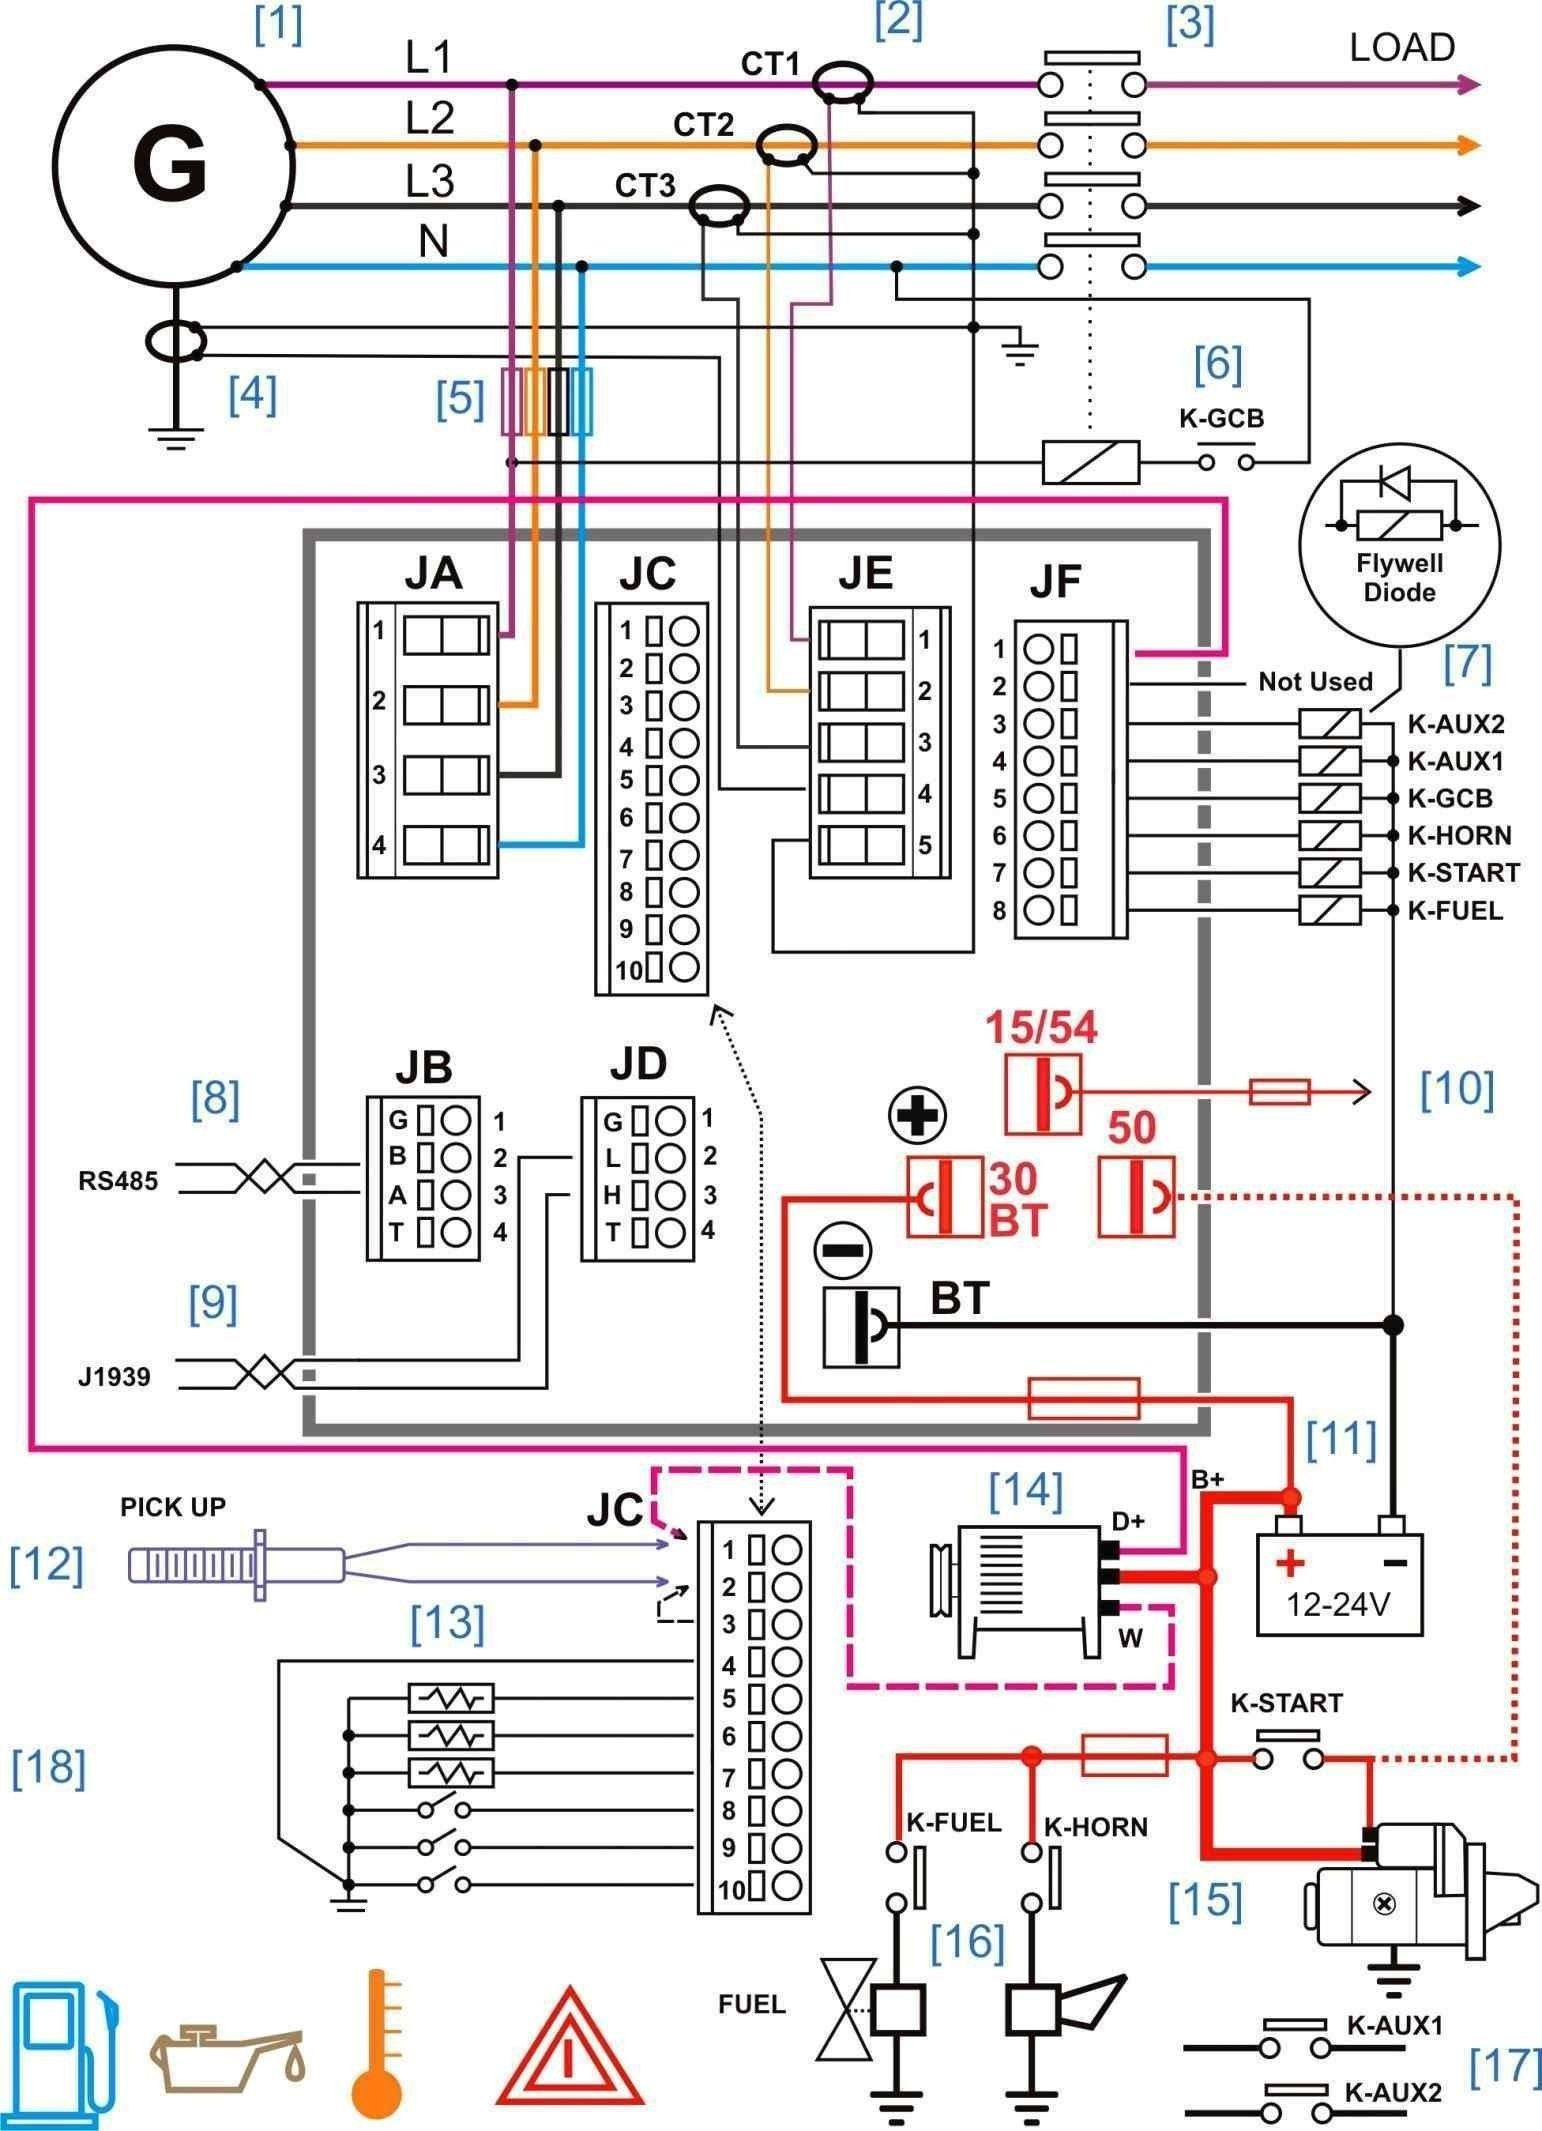 Unique Bmw E46 Heated Seat Wiring Diagram Diagram Diagramtemplate Diagramsample Diagrama De Circuito Diagrama De Instalacion Electrica Esquemas Electronicos